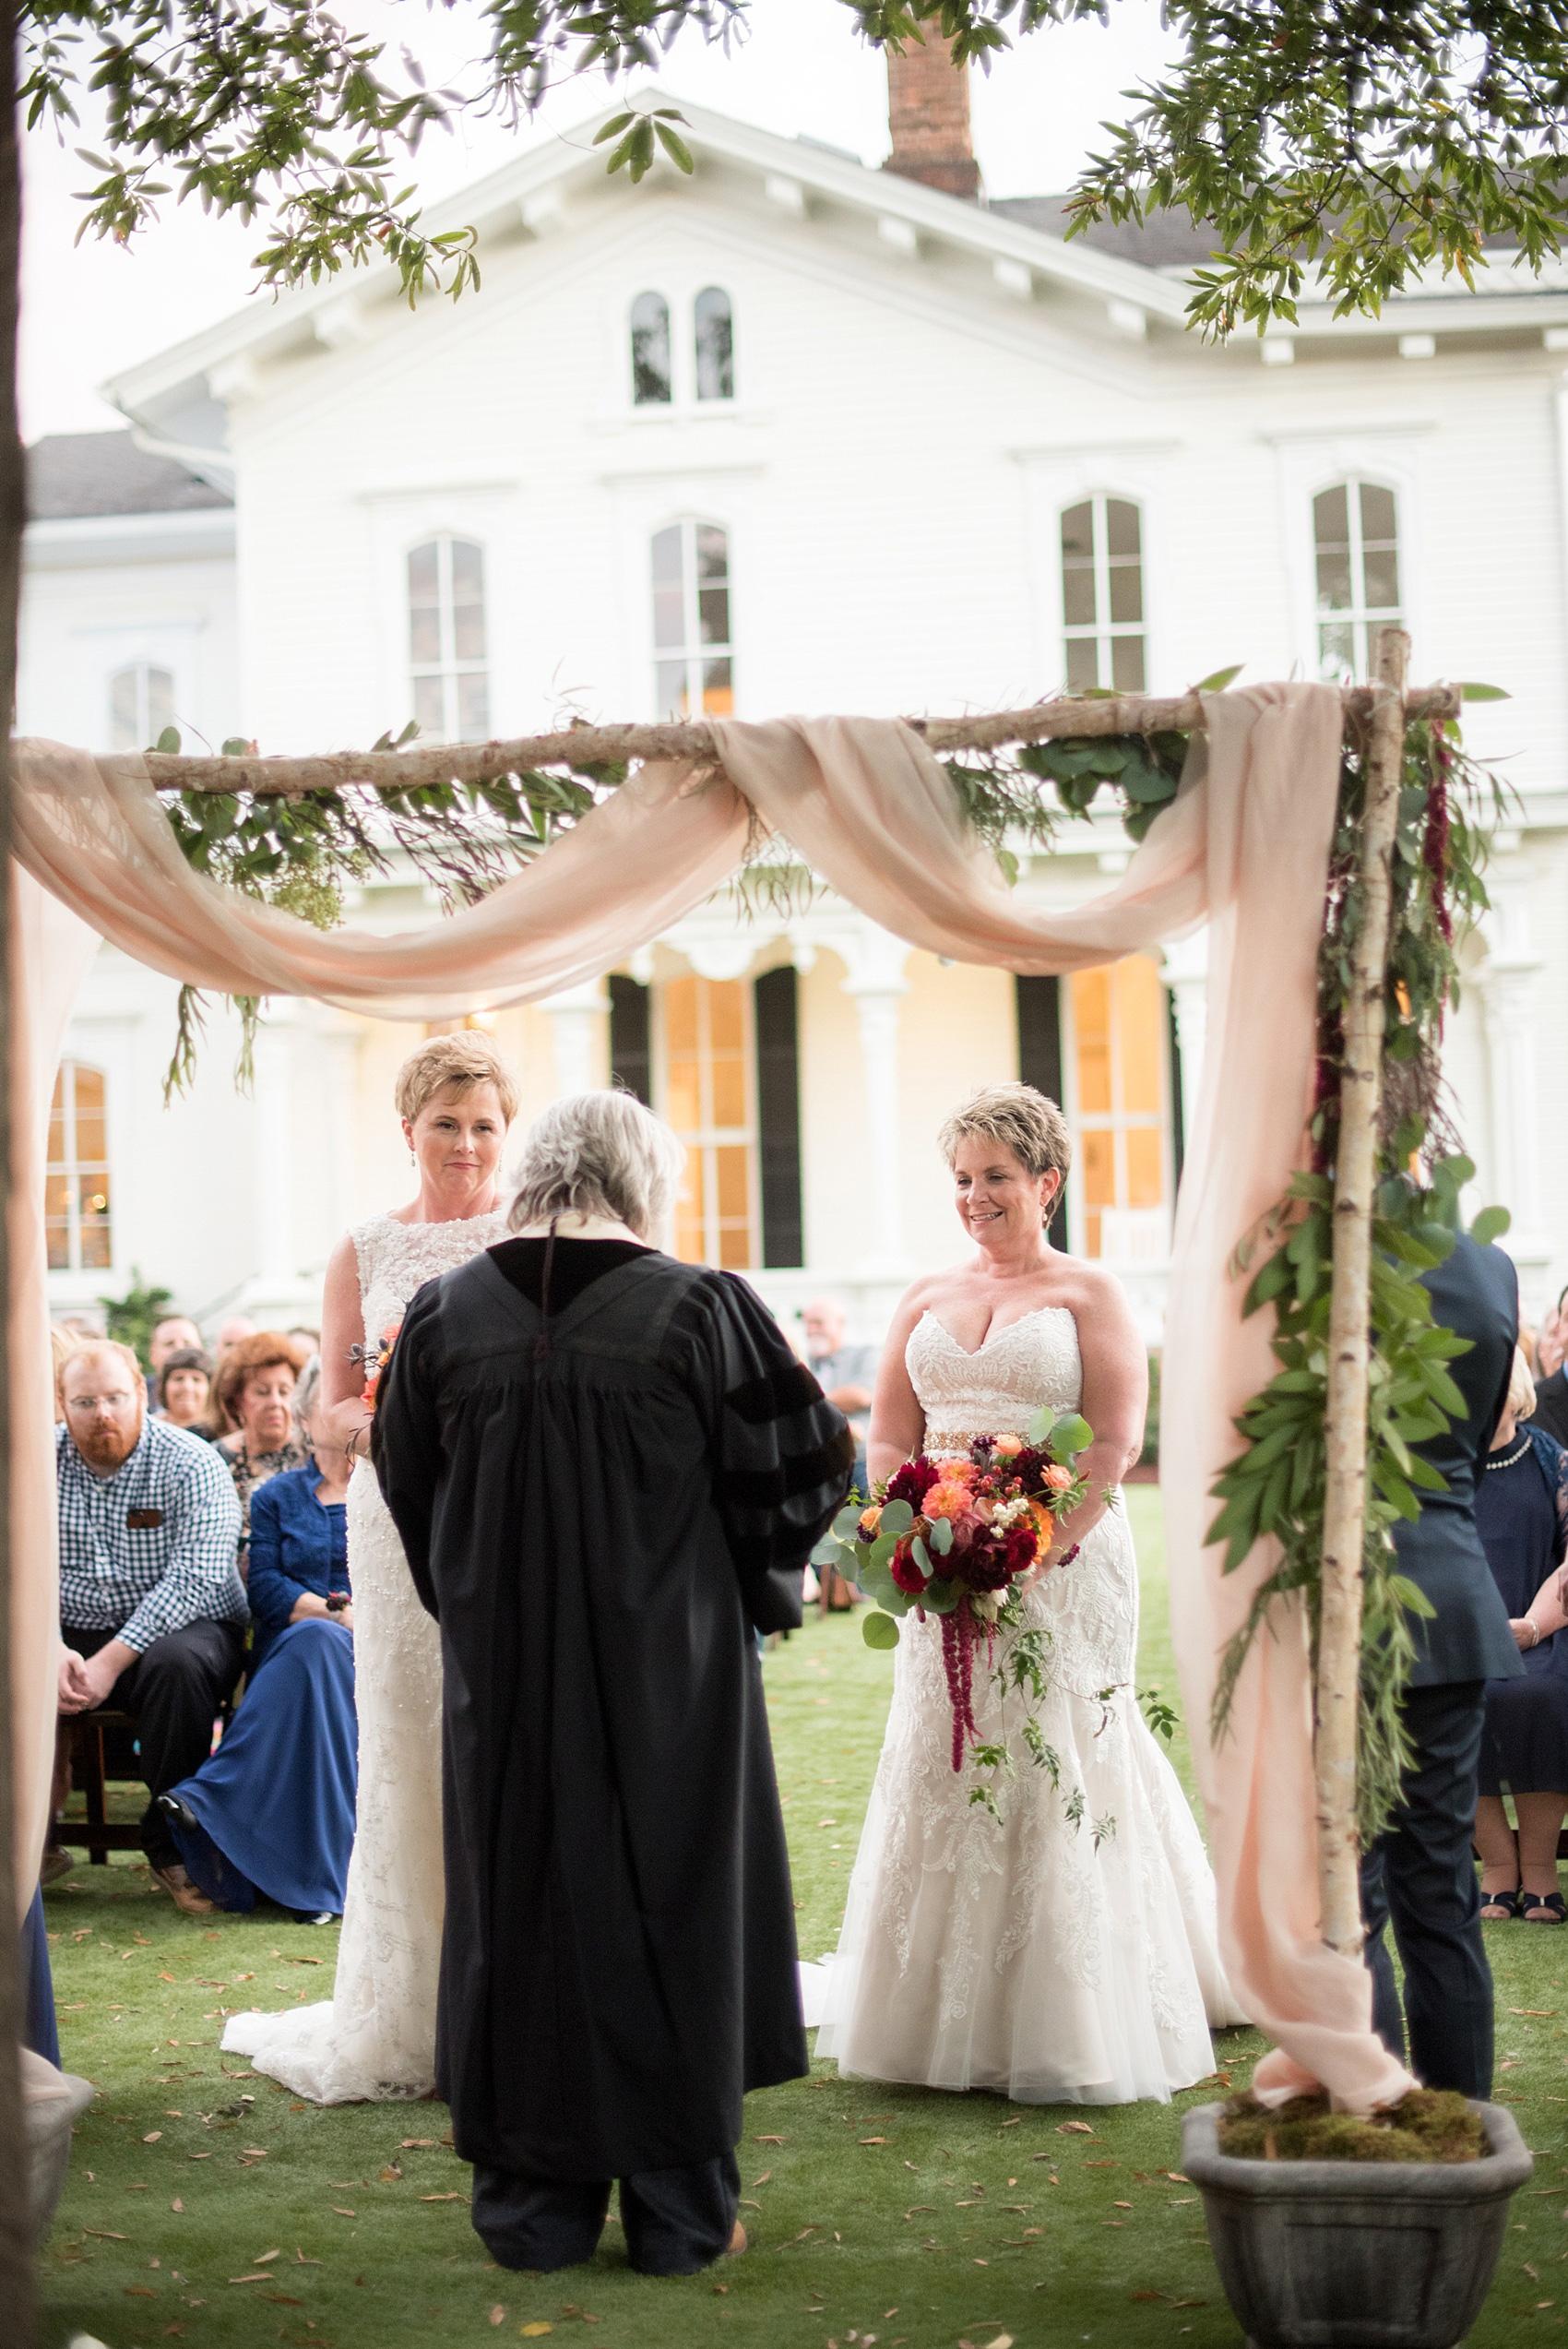 Merrimon Wynne House Raleigh Wedding Photos Linda